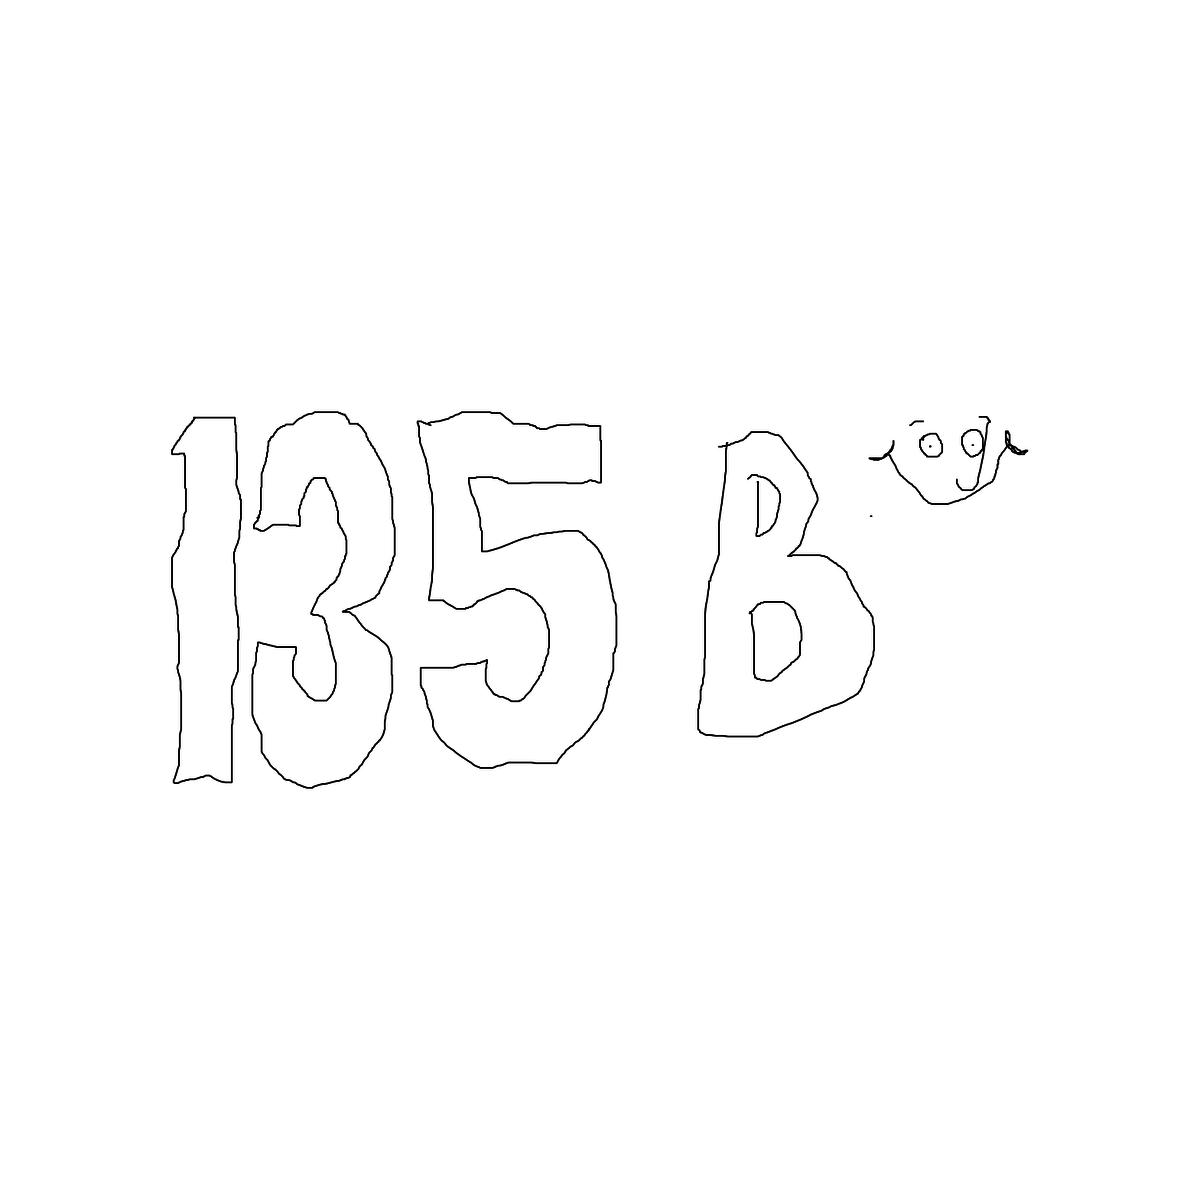 BAAAM drawing#253 lat:41.6303520202636700lng: -71.0010833740234400